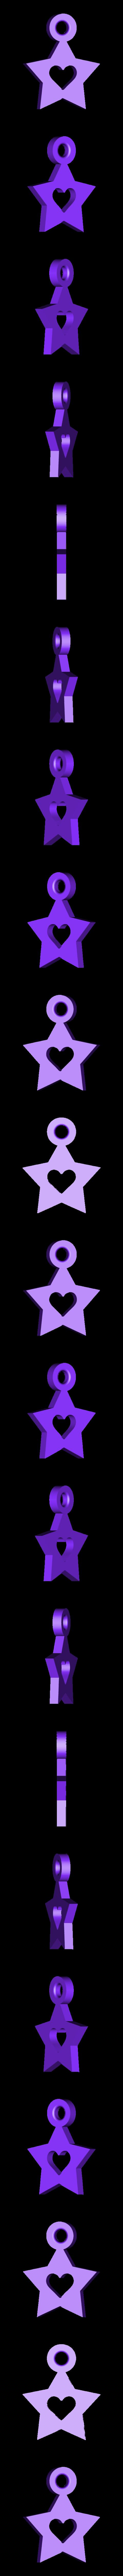 BonGarcon-SantaStar-Part_3.stl Download free STL file SANTA STAR -with a Tingling Heart inside- • 3D printer object, BonGarcon